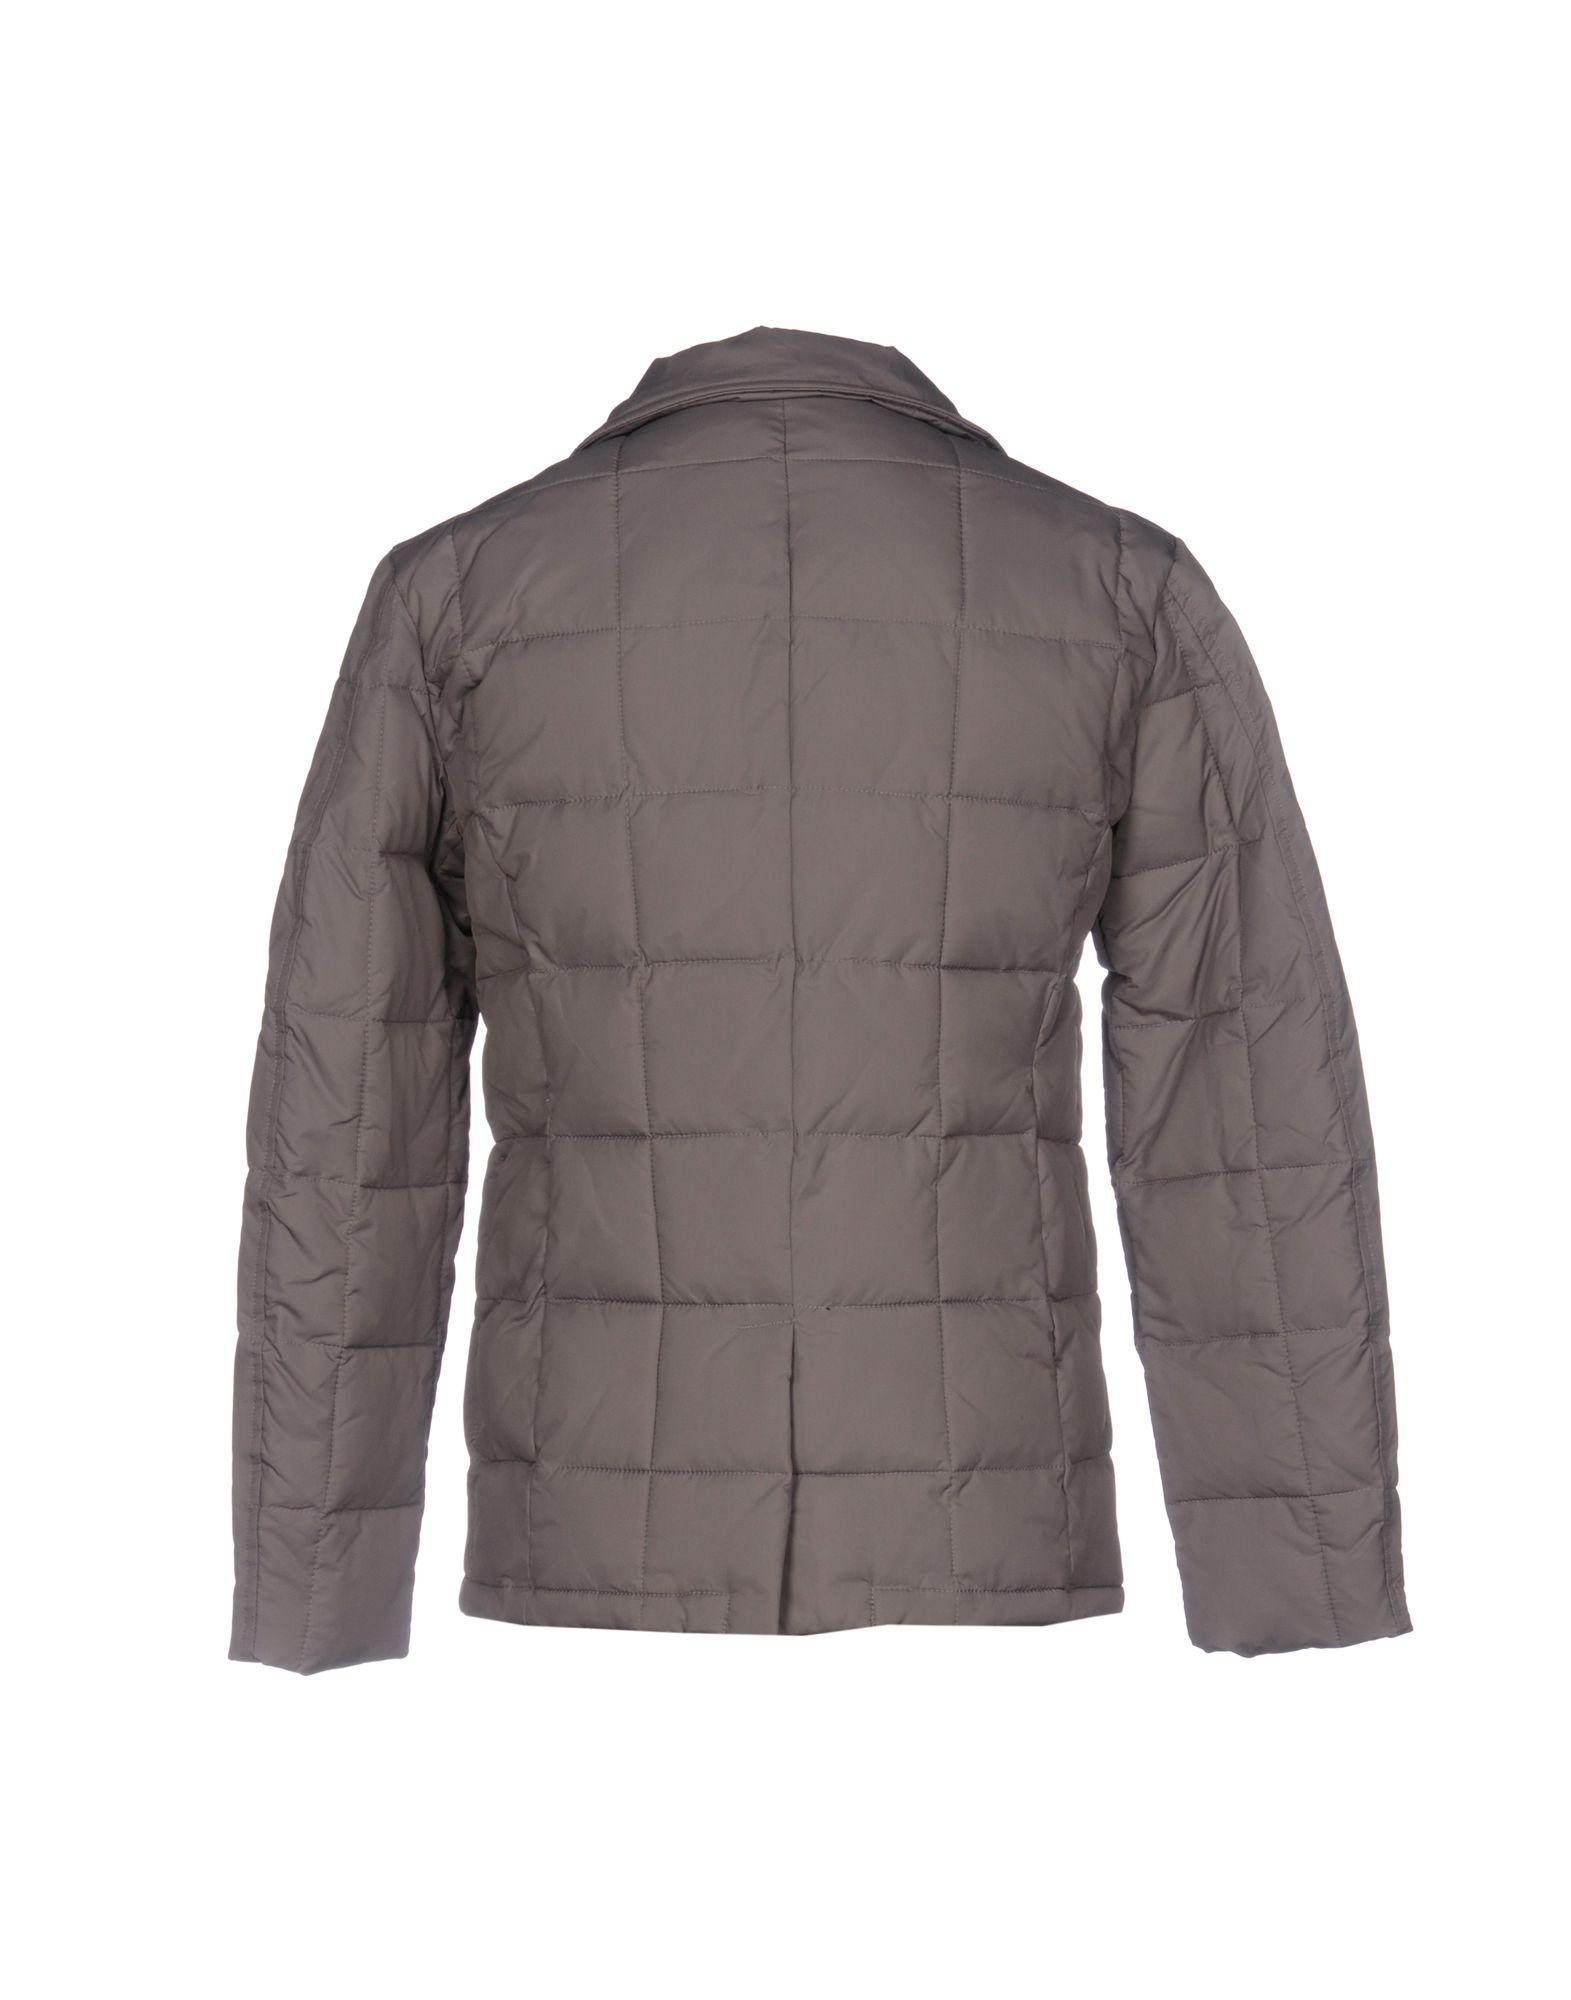 Ballantyne Synthetic Jacket in Grey (Grey) for Men